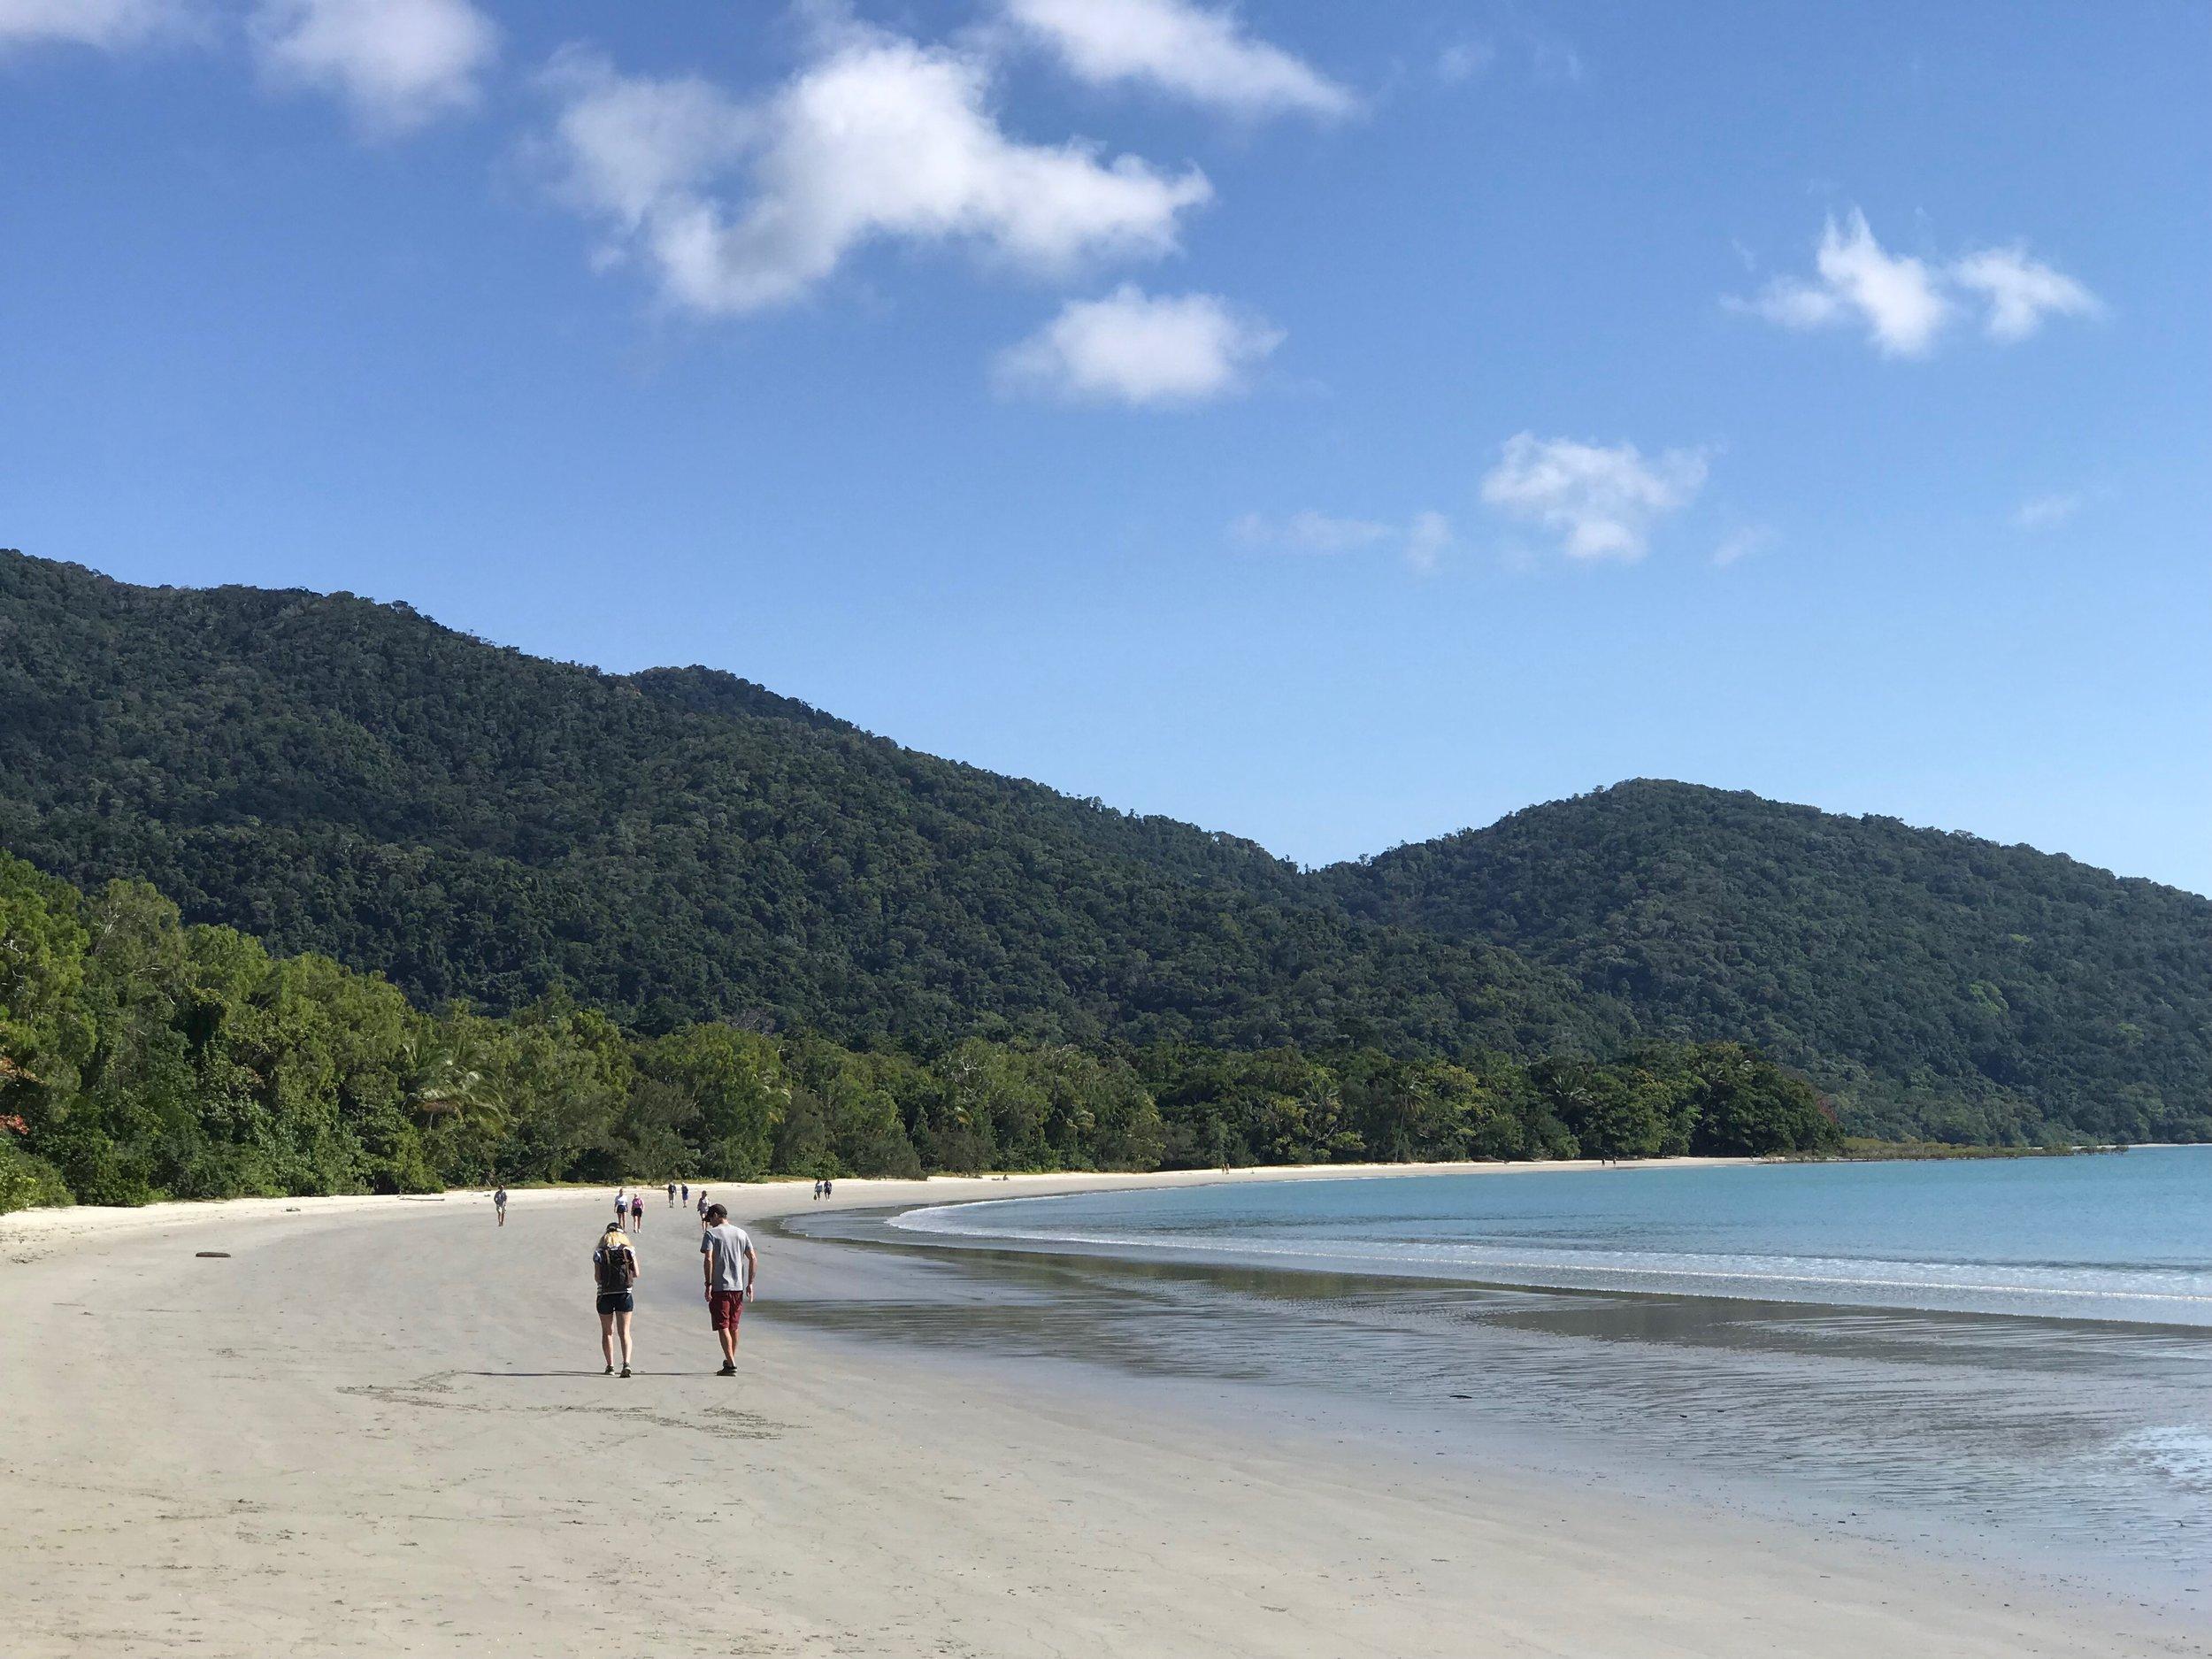 Cape Trib beach - beautiful, but no swimming